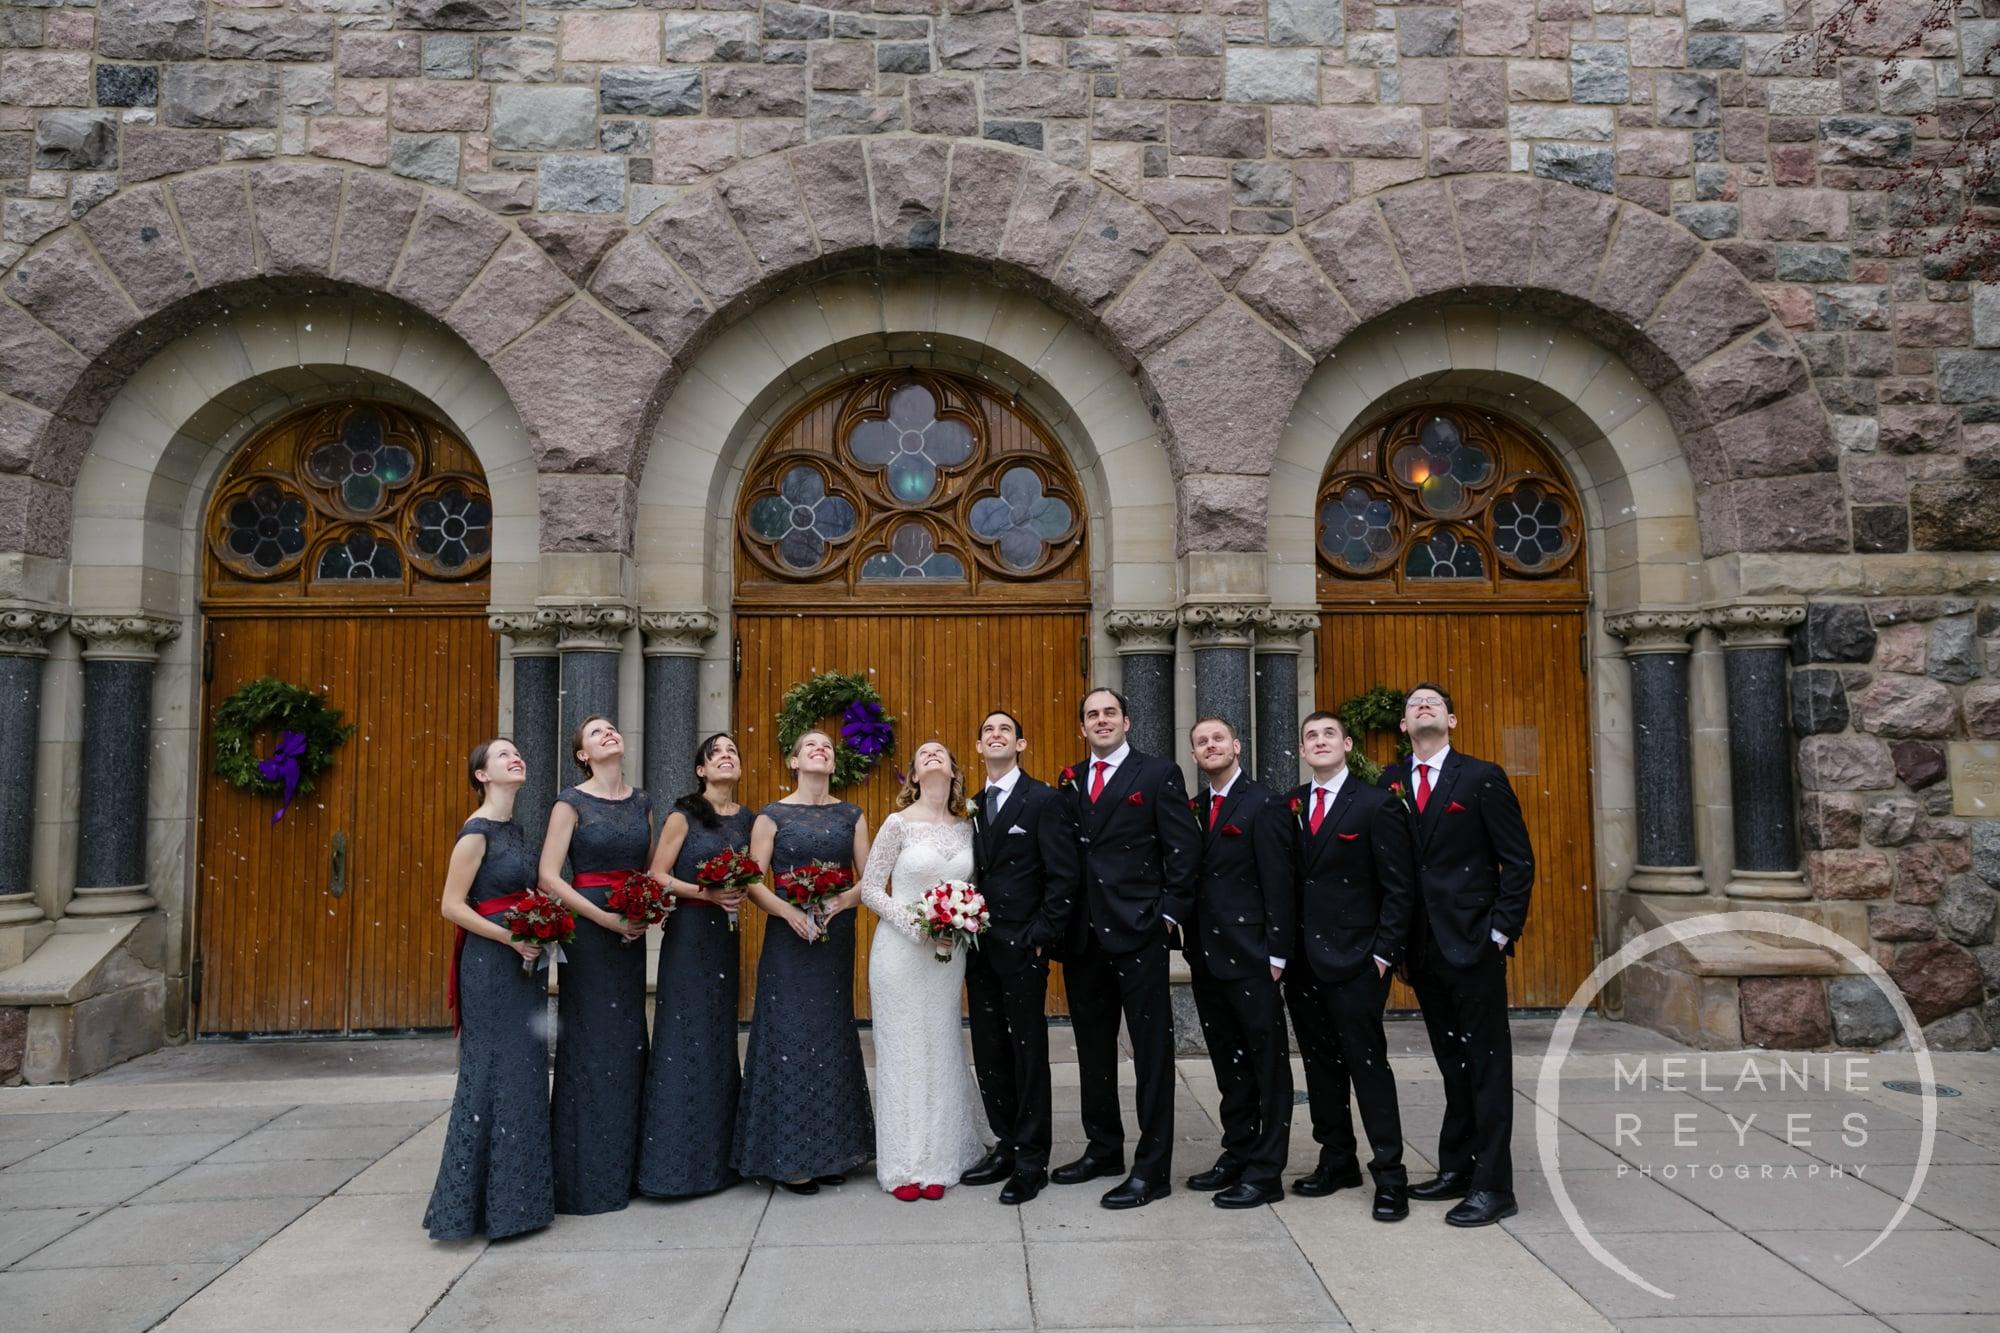 2015_ann_arbor_wedding_photographer_melaniereyes_011.JPG